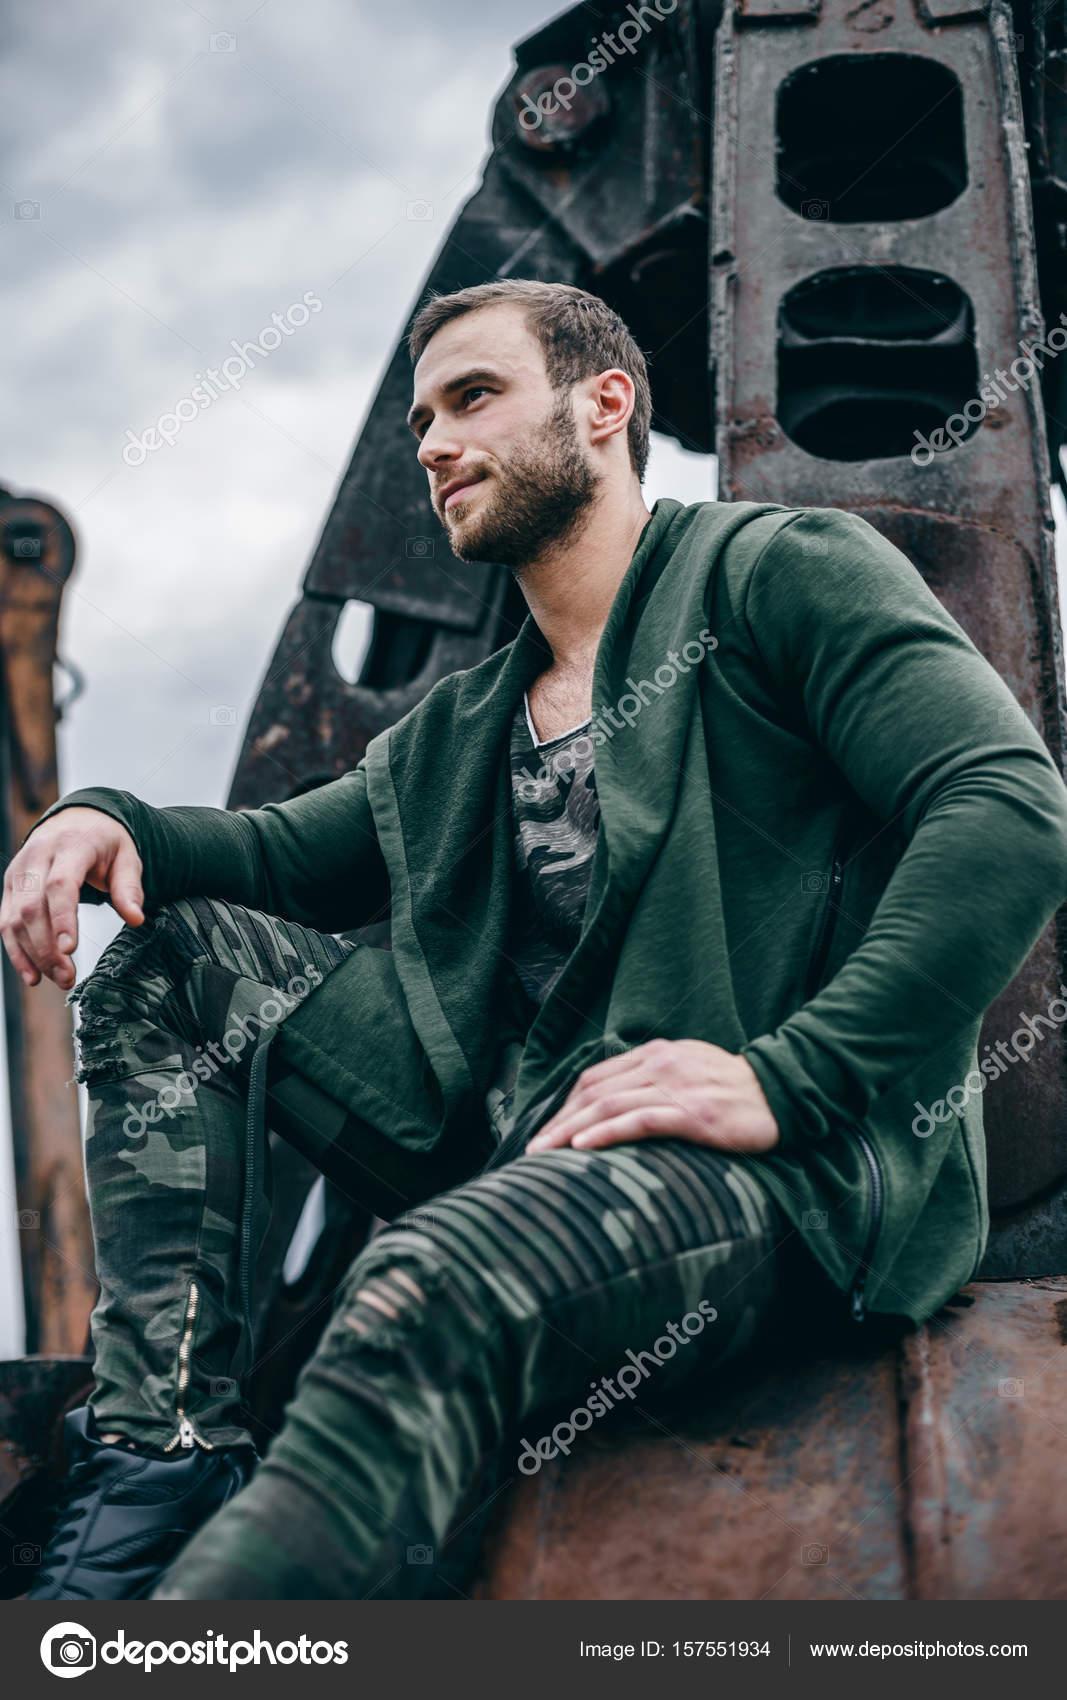 Portrait fashion man wearing clothes khaki colors in urban